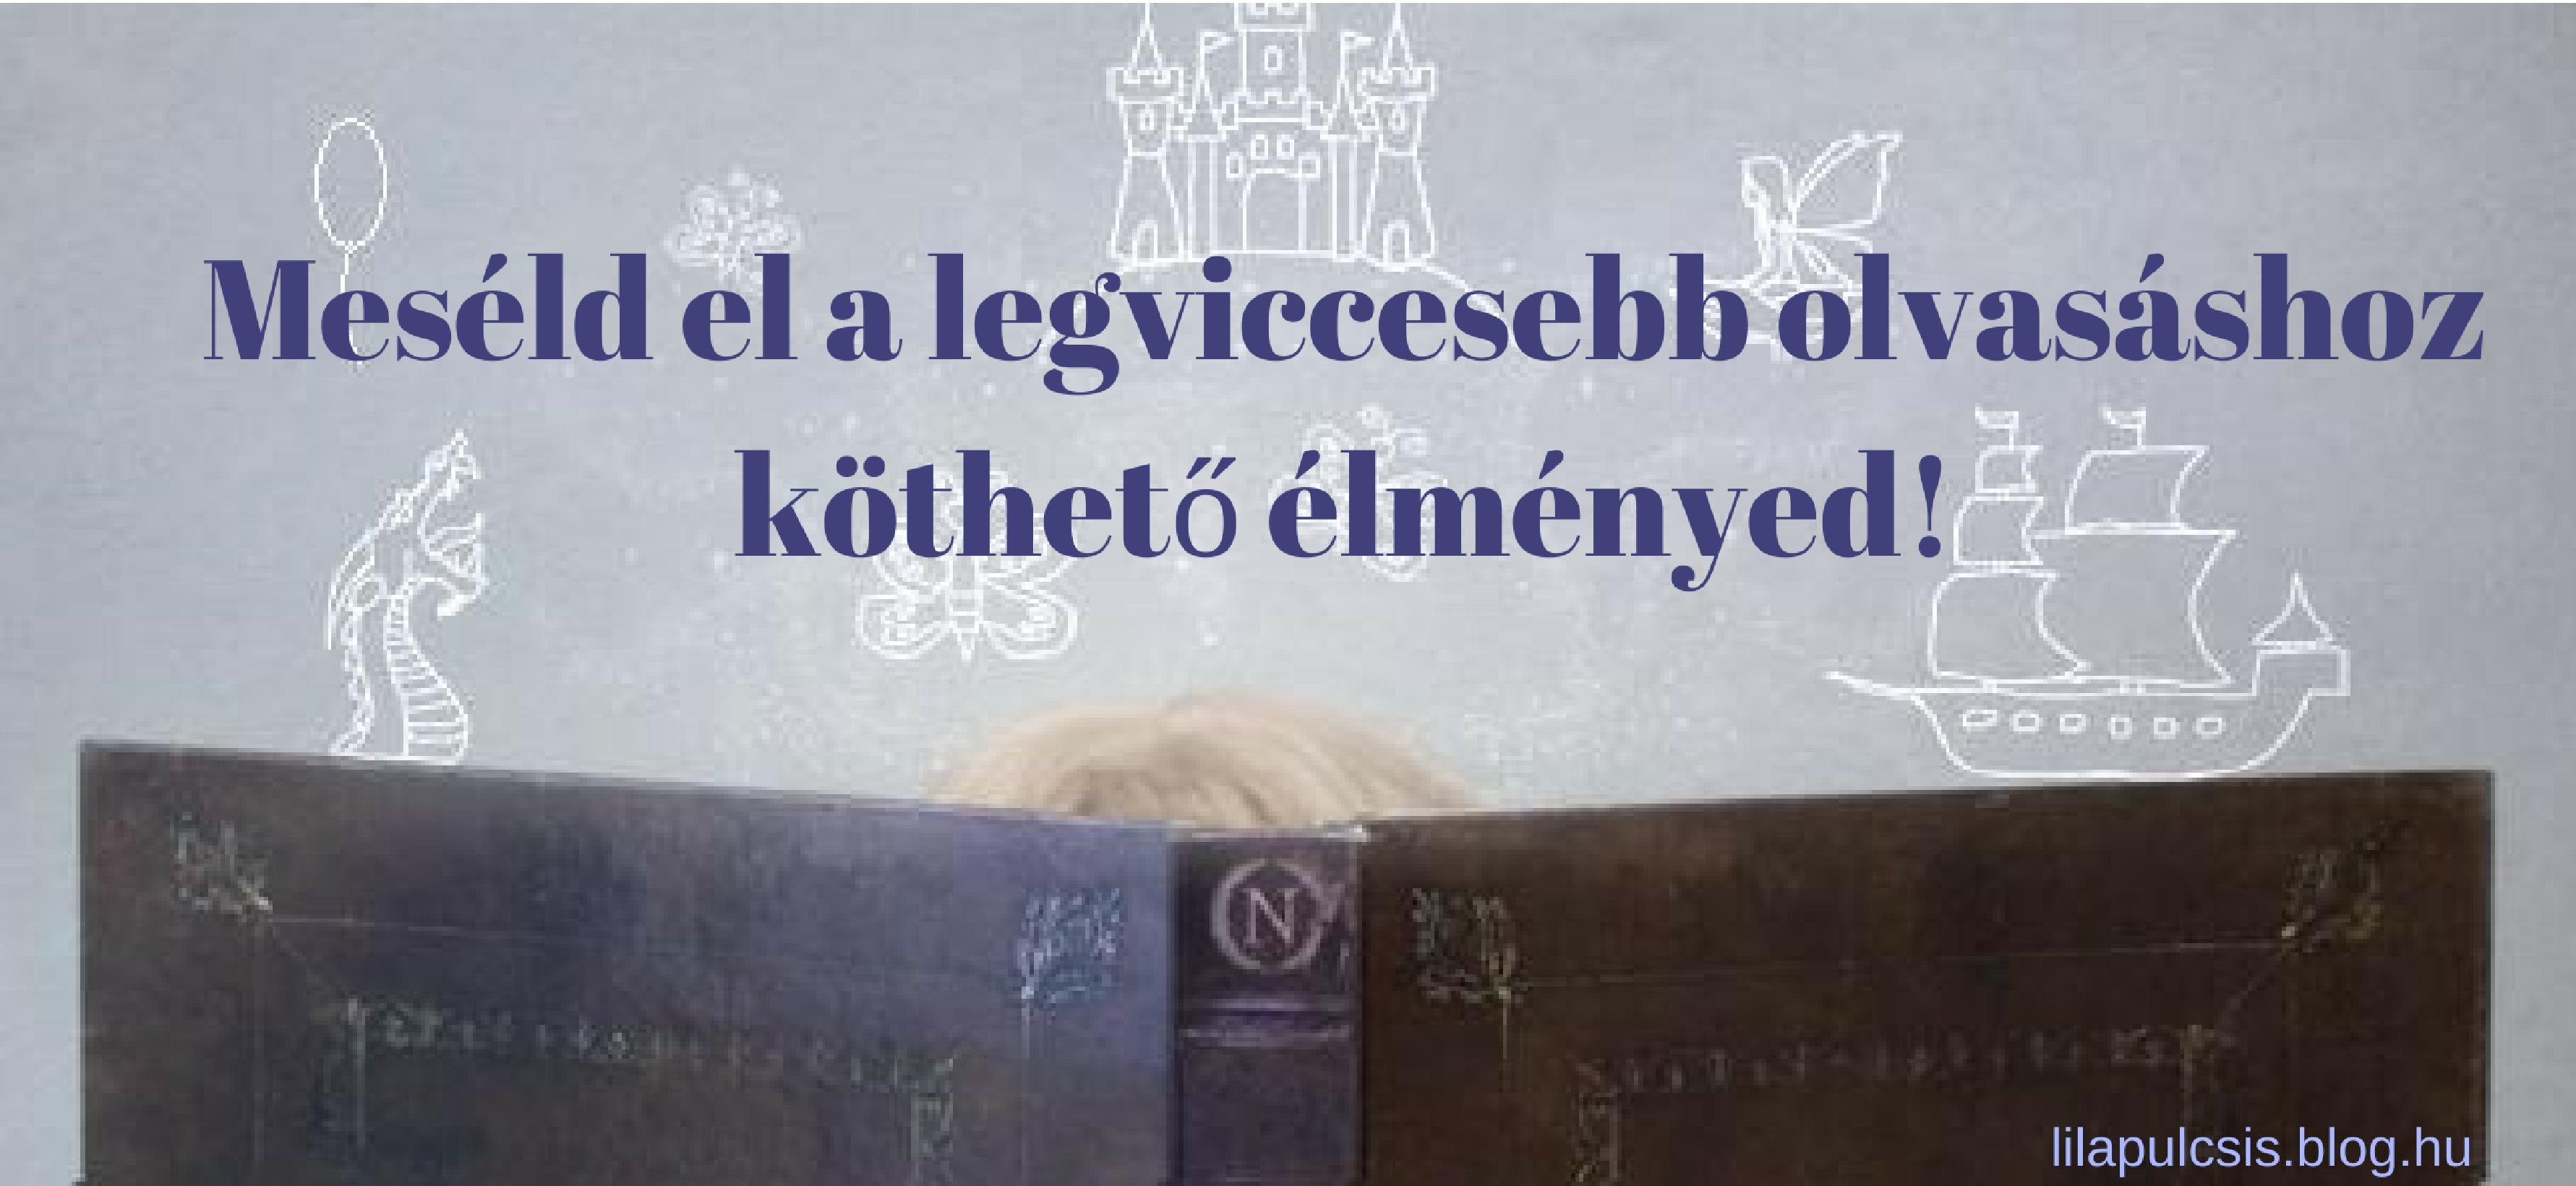 meseld_el_a_legviccesebb_olvasashoz_kotheto_elmenyed.jpg